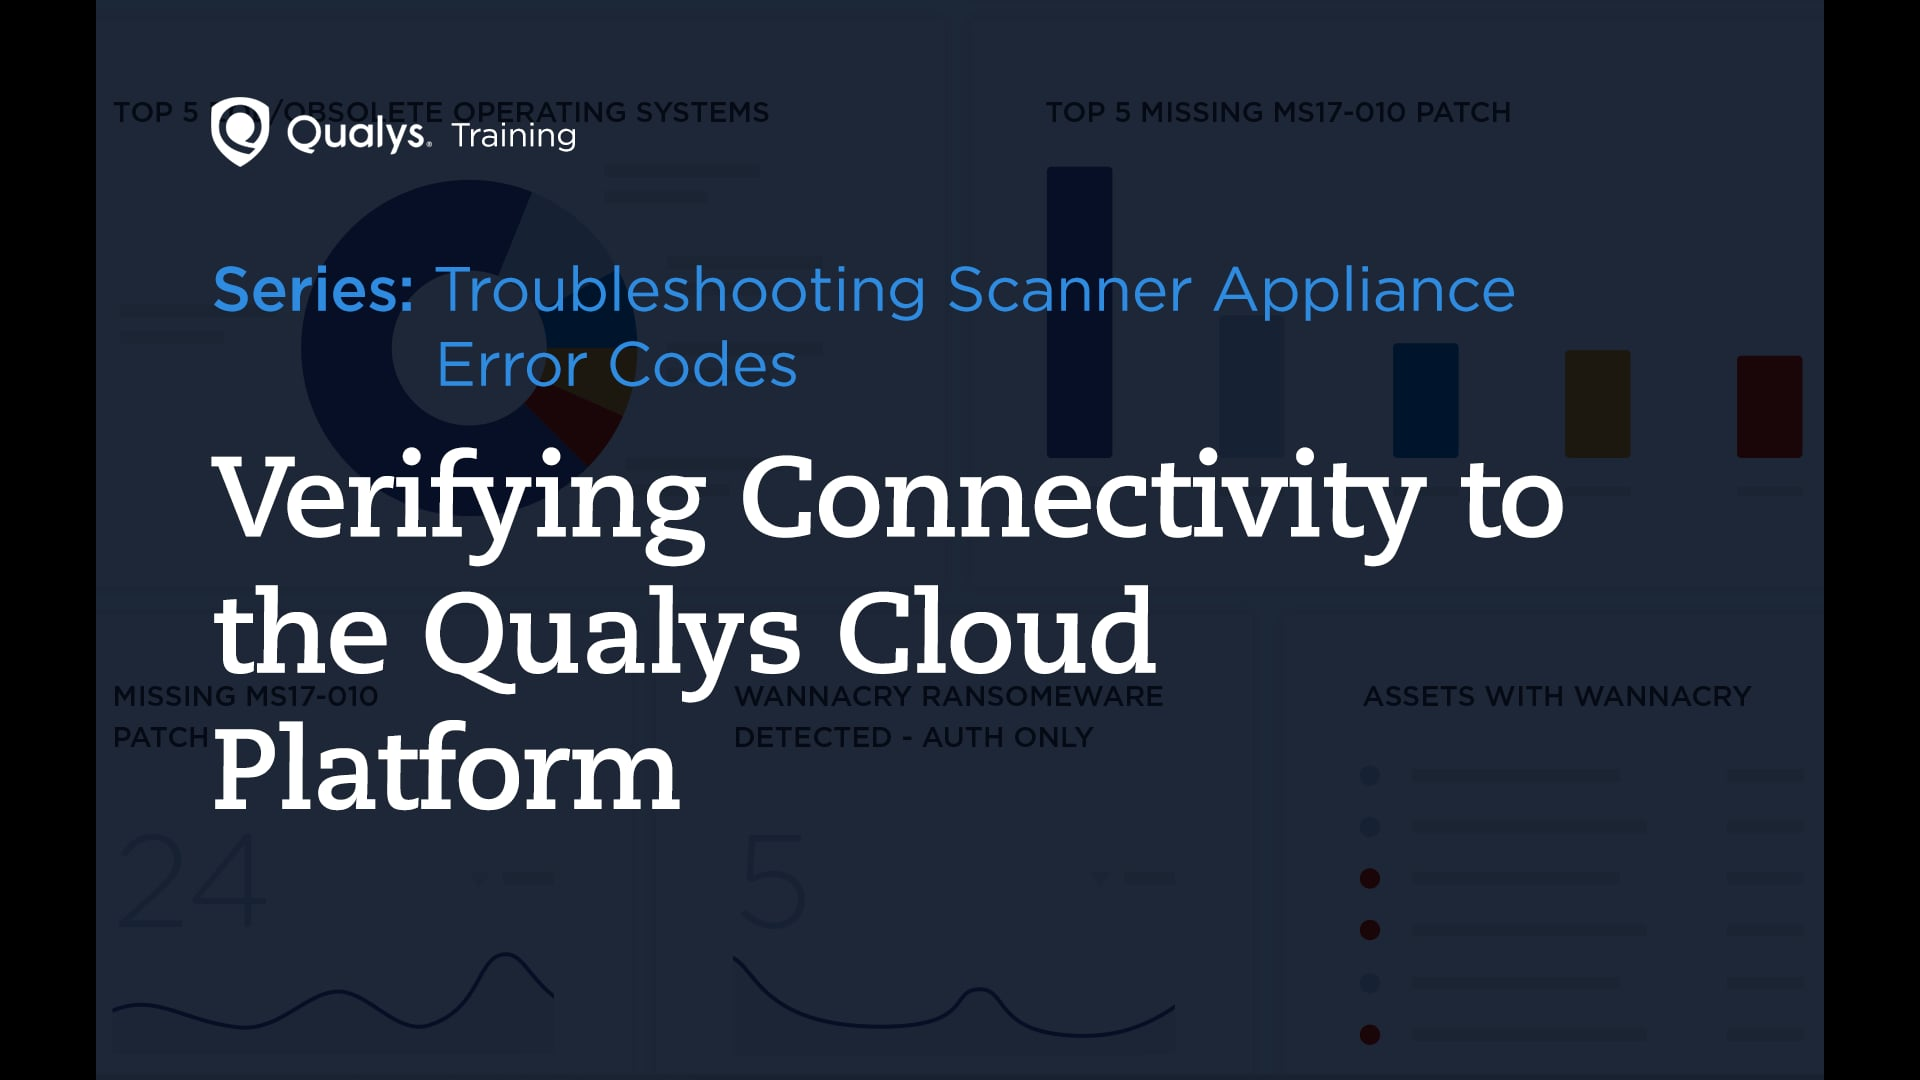 Verifying Connectivity to the Qualys Cloud Platform